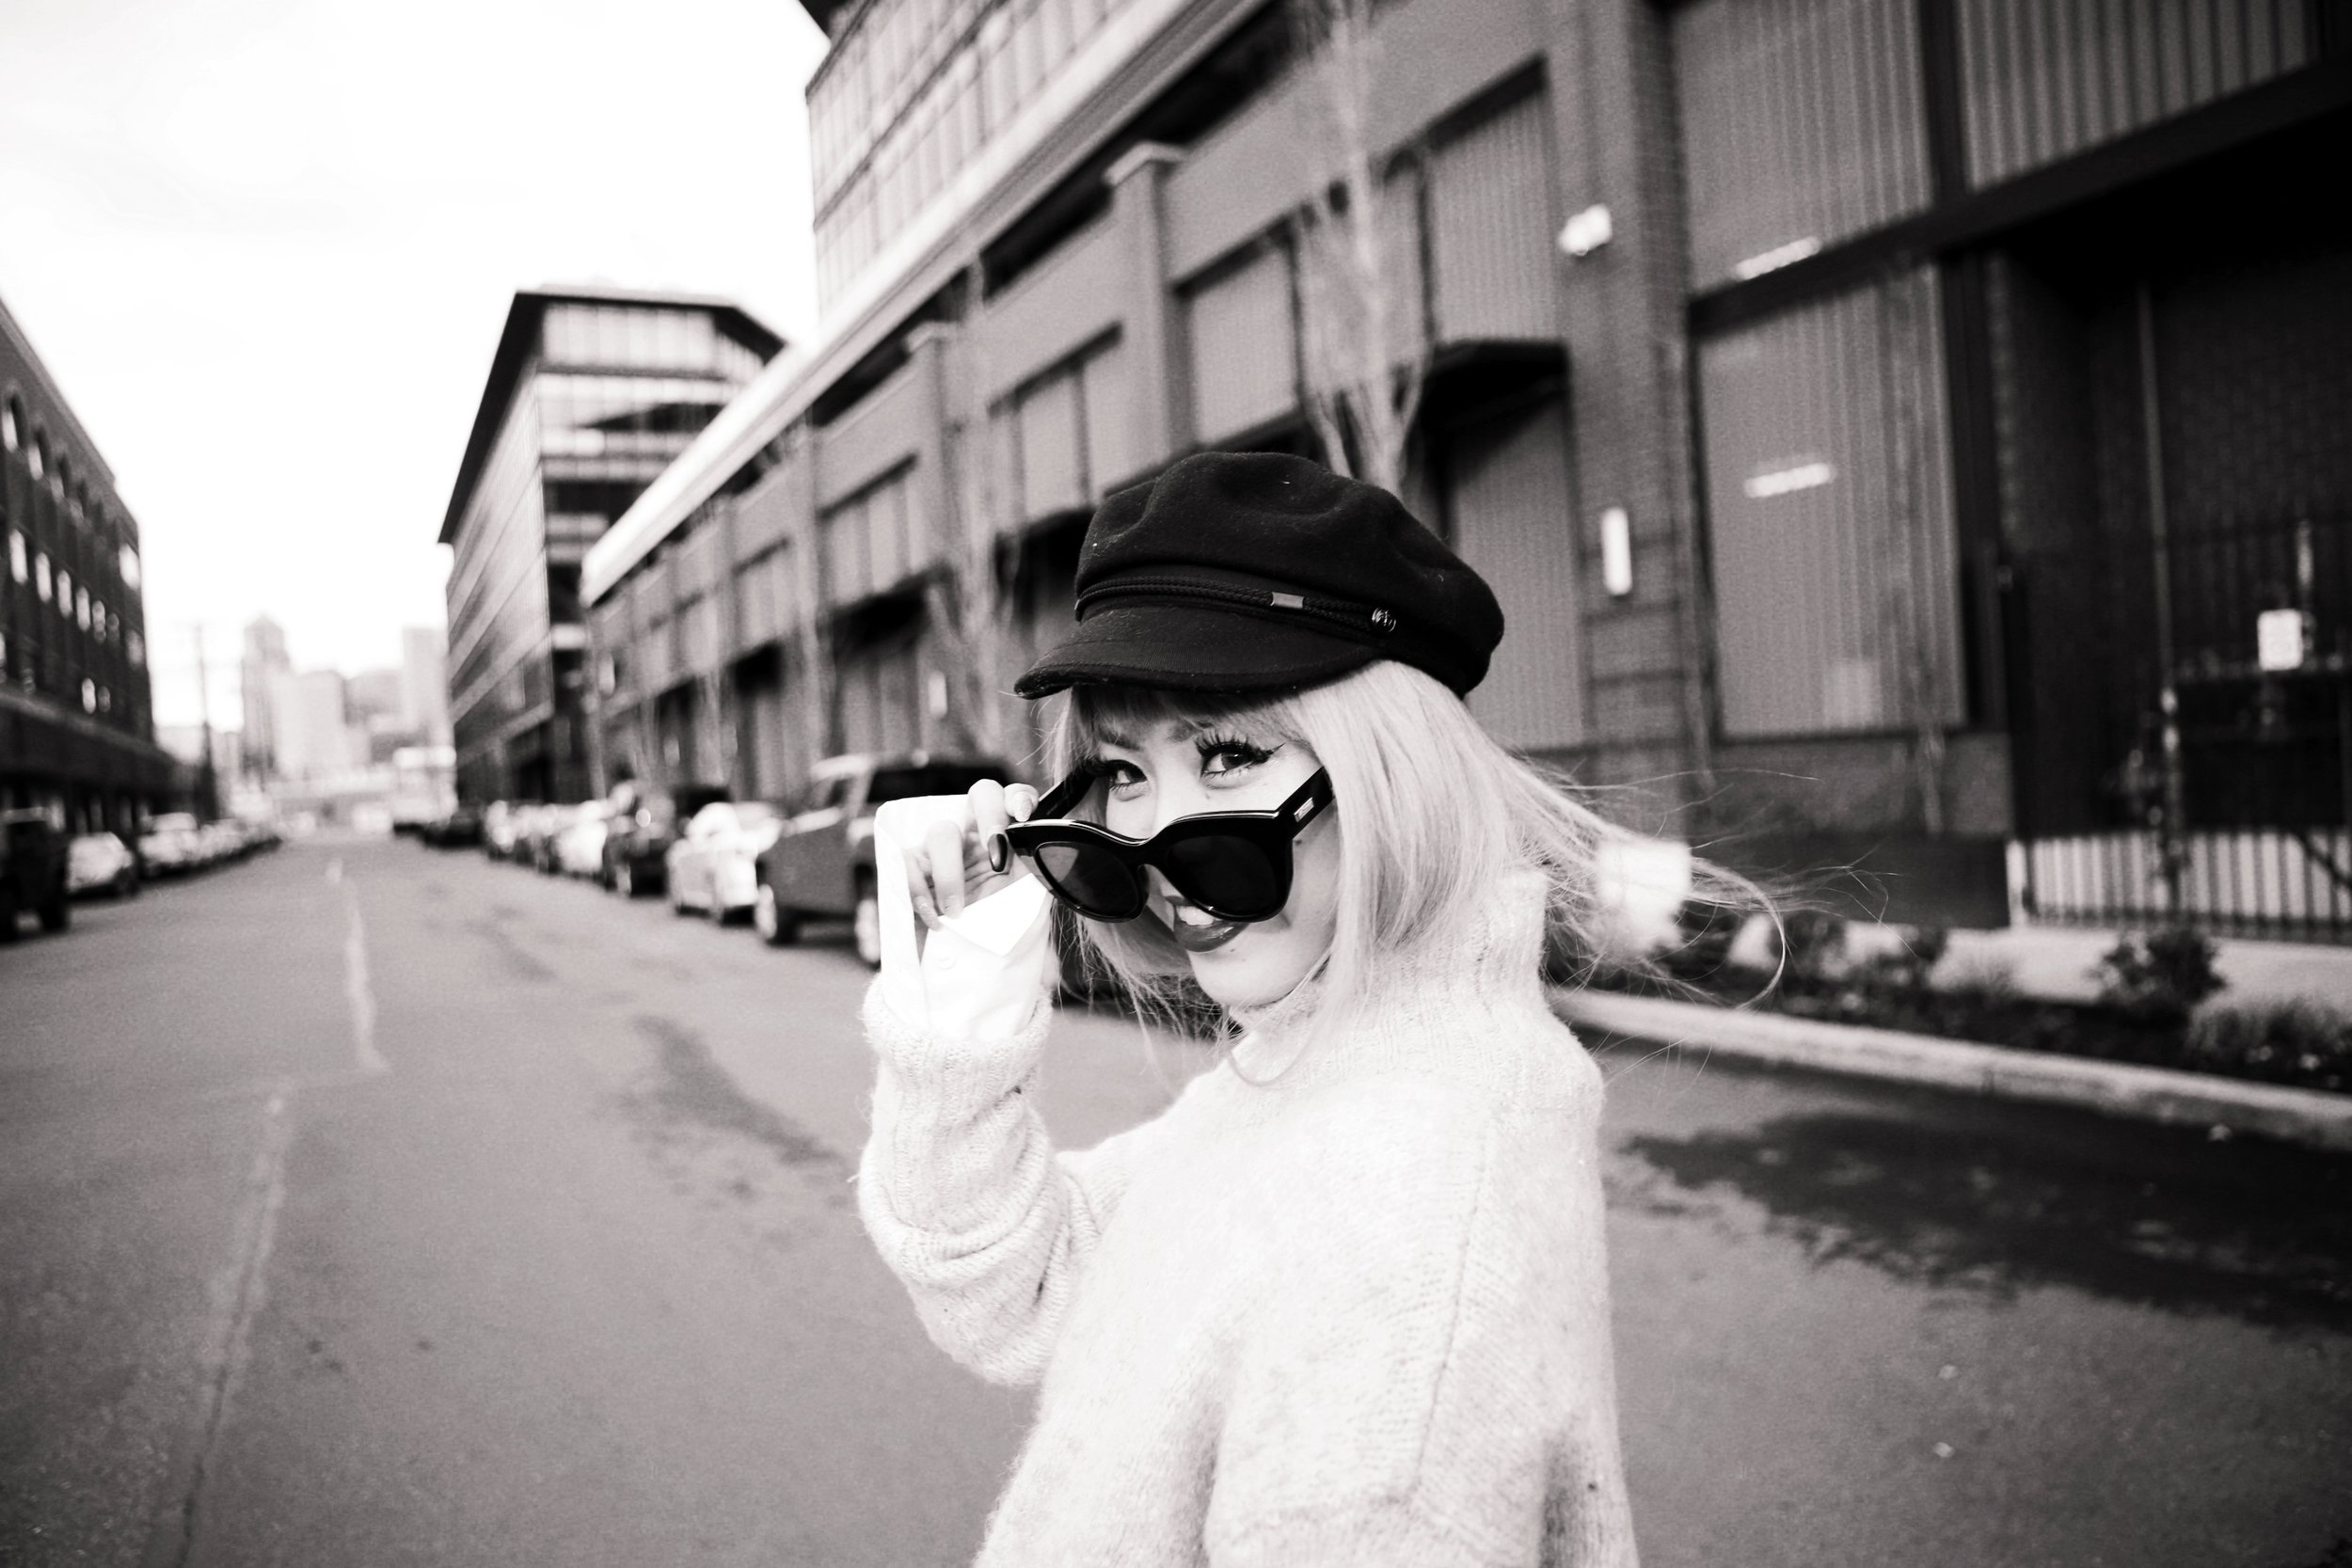 Isabel Marant News Boy Hat-H&M Gray Turtleneck Sweater-H&M Wide cuff Cotton Shirt-Forever 21 Pleated Mini Skirt-Boohoo Wide Fishnet Tights-ZARA Velvet Bag-ALDO Patent Booties-Le Specs Air Heart Sunglasses-Milani Black Cherry Lipstick-Aikas Love Closet-Seattle Style Lifestyle Blogger-japanese-pink hair 11